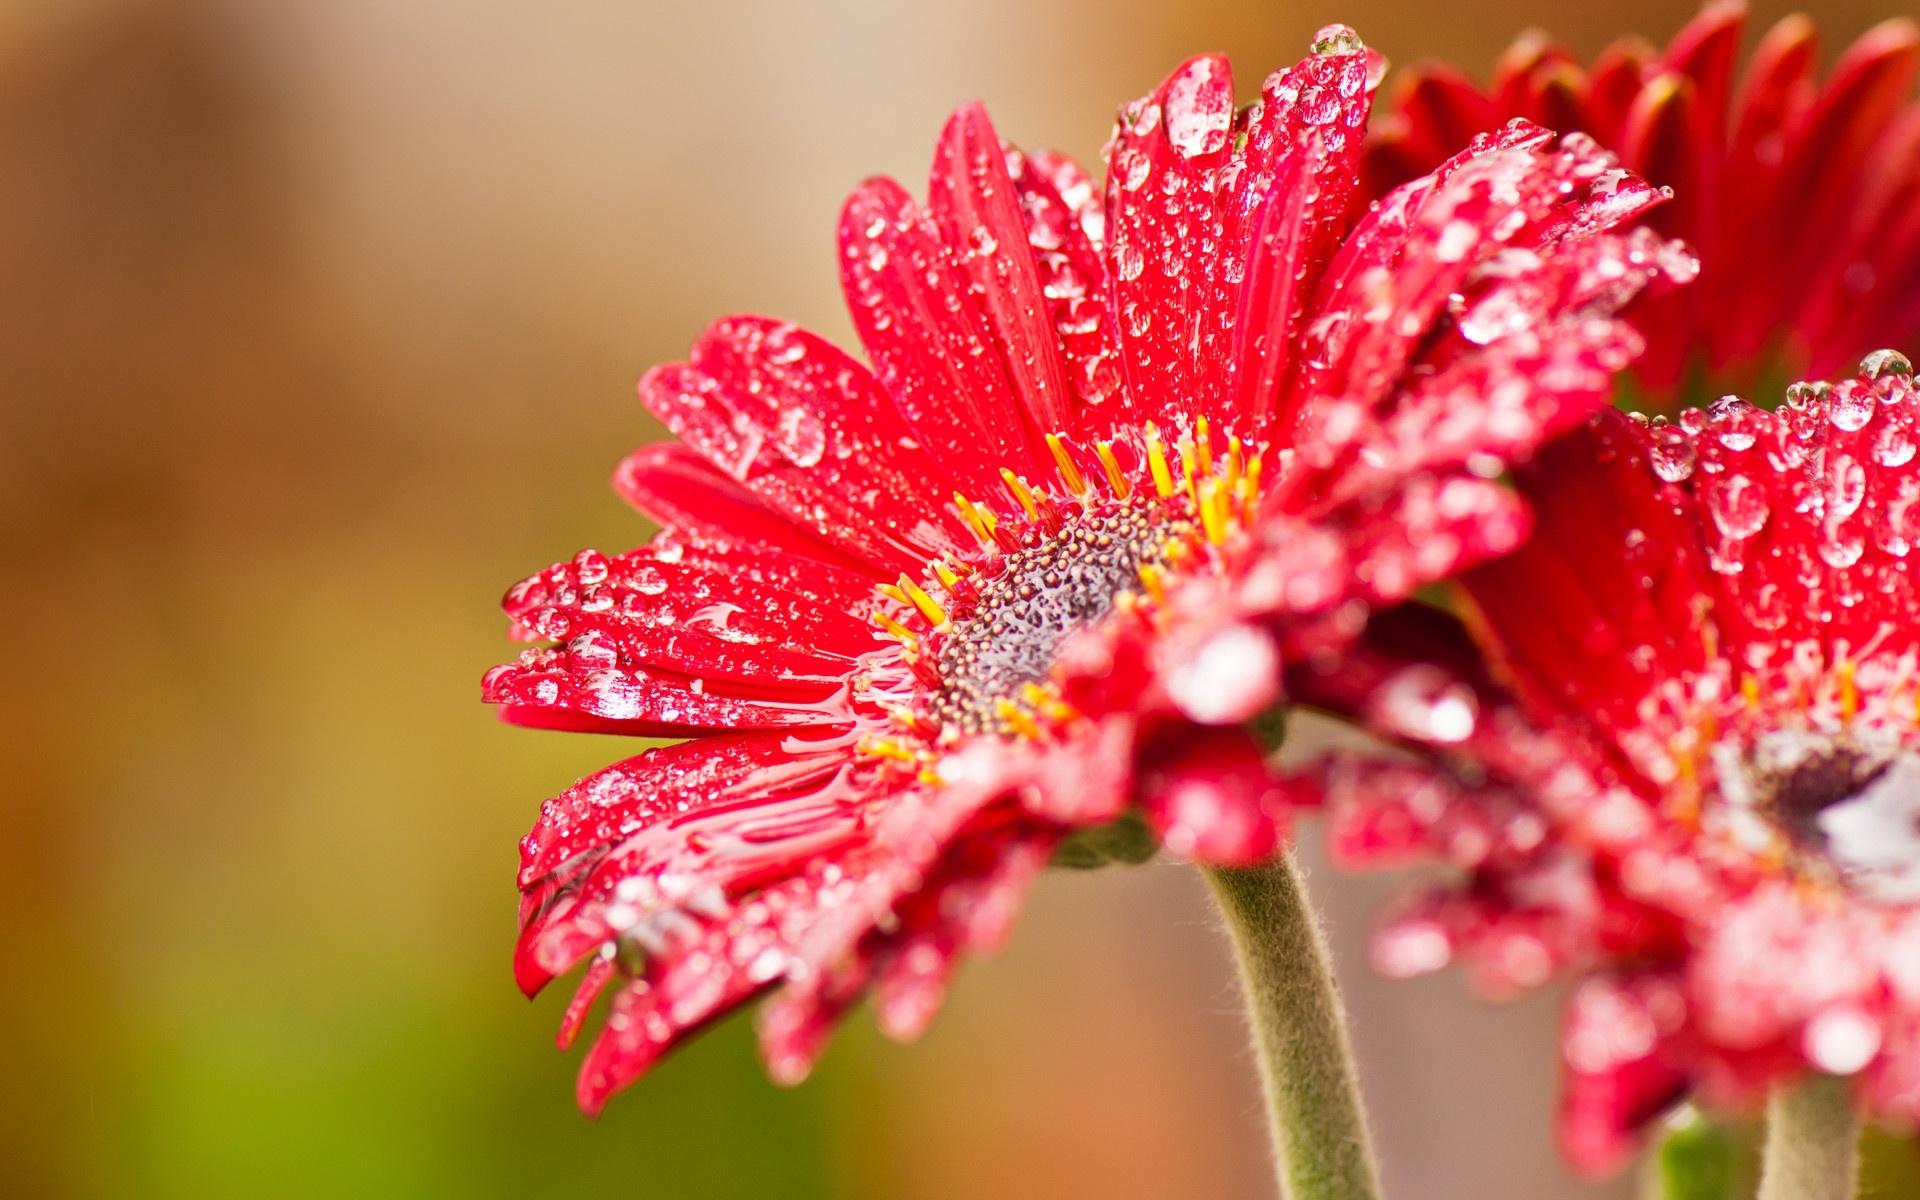 Wallpaper Red Gerbera Flowers After Rain 1920x1200 Hd